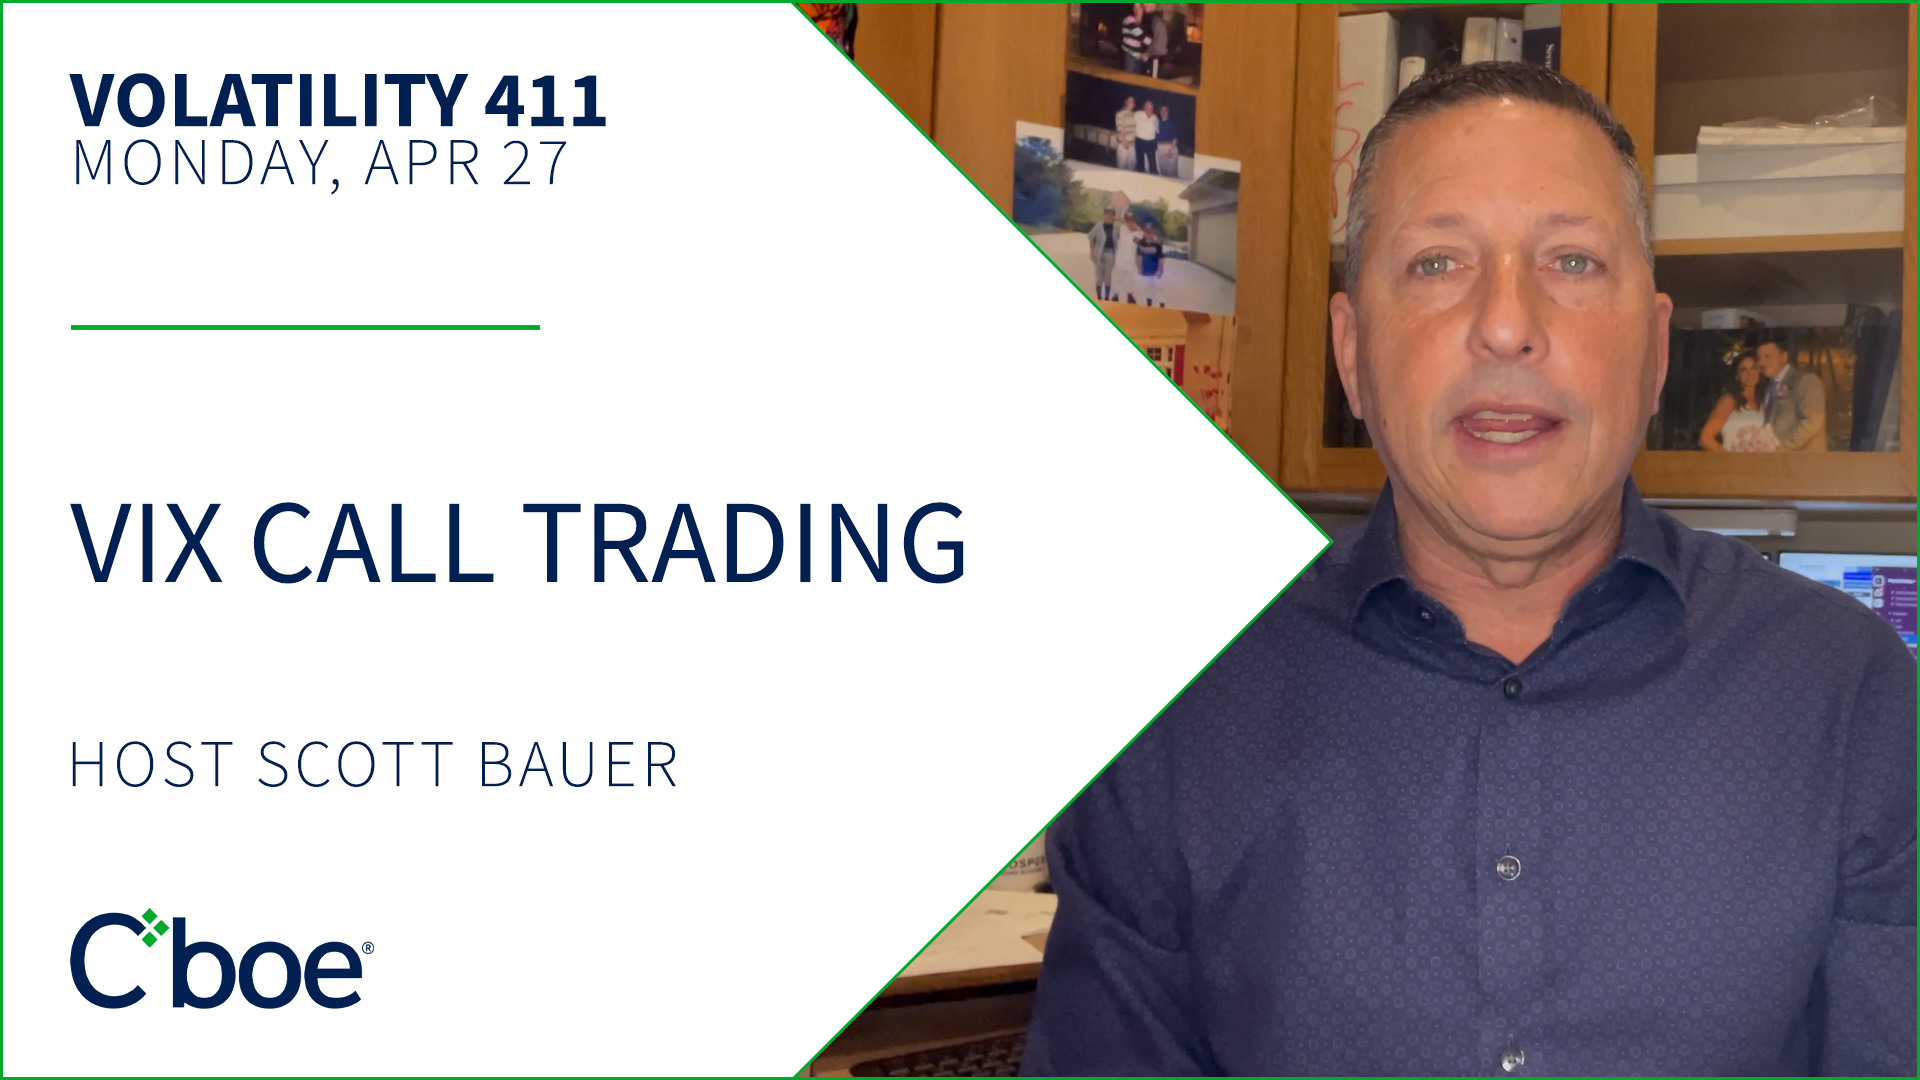 VIX Call Trading Thumbnail